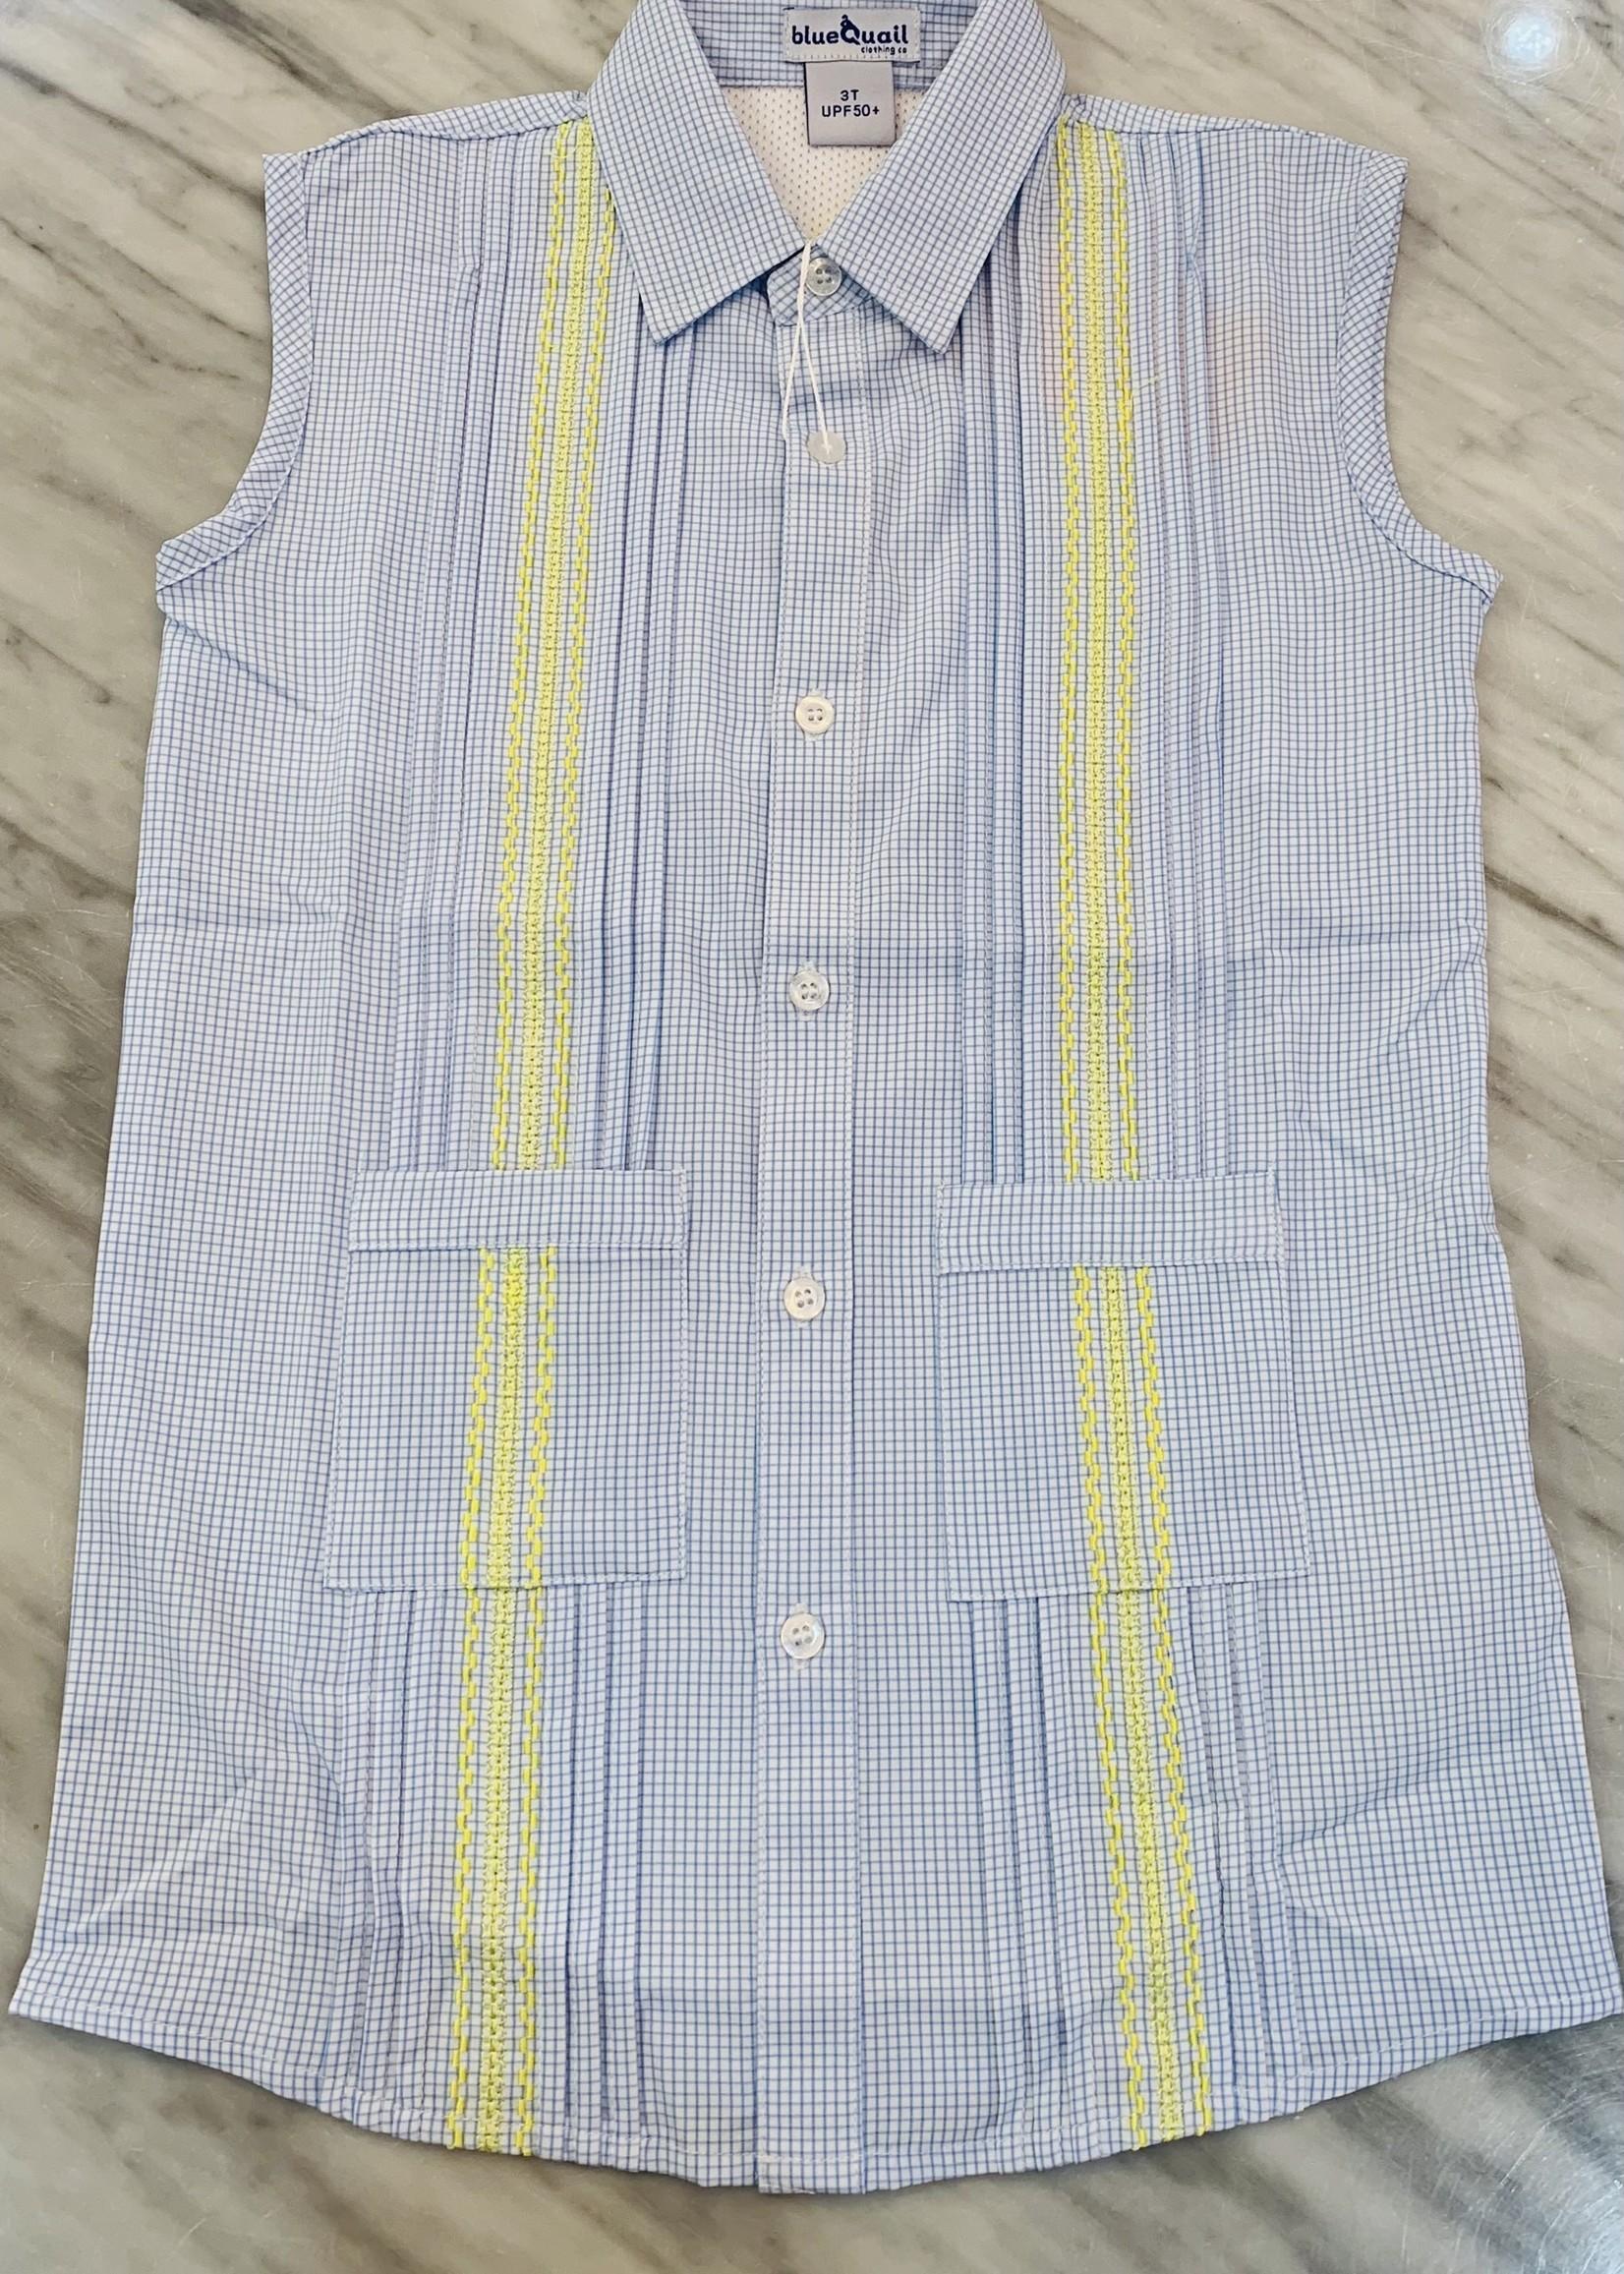 GUAYABERA DRESS - LT BL/YL